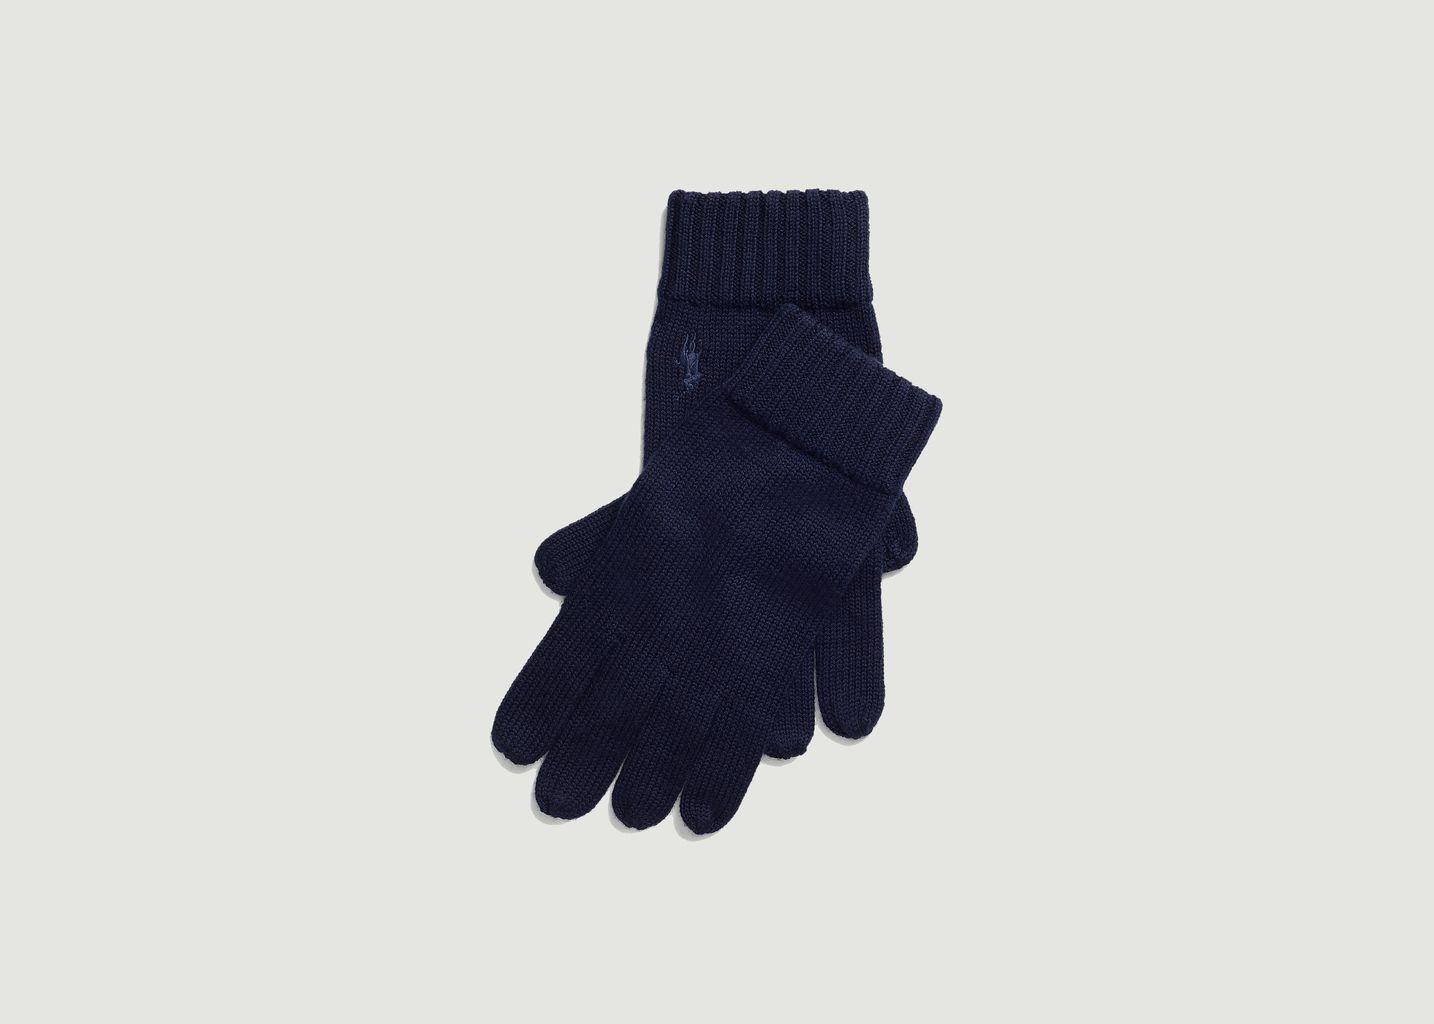 Gants siglés en laine mérinos - Polo Ralph Lauren